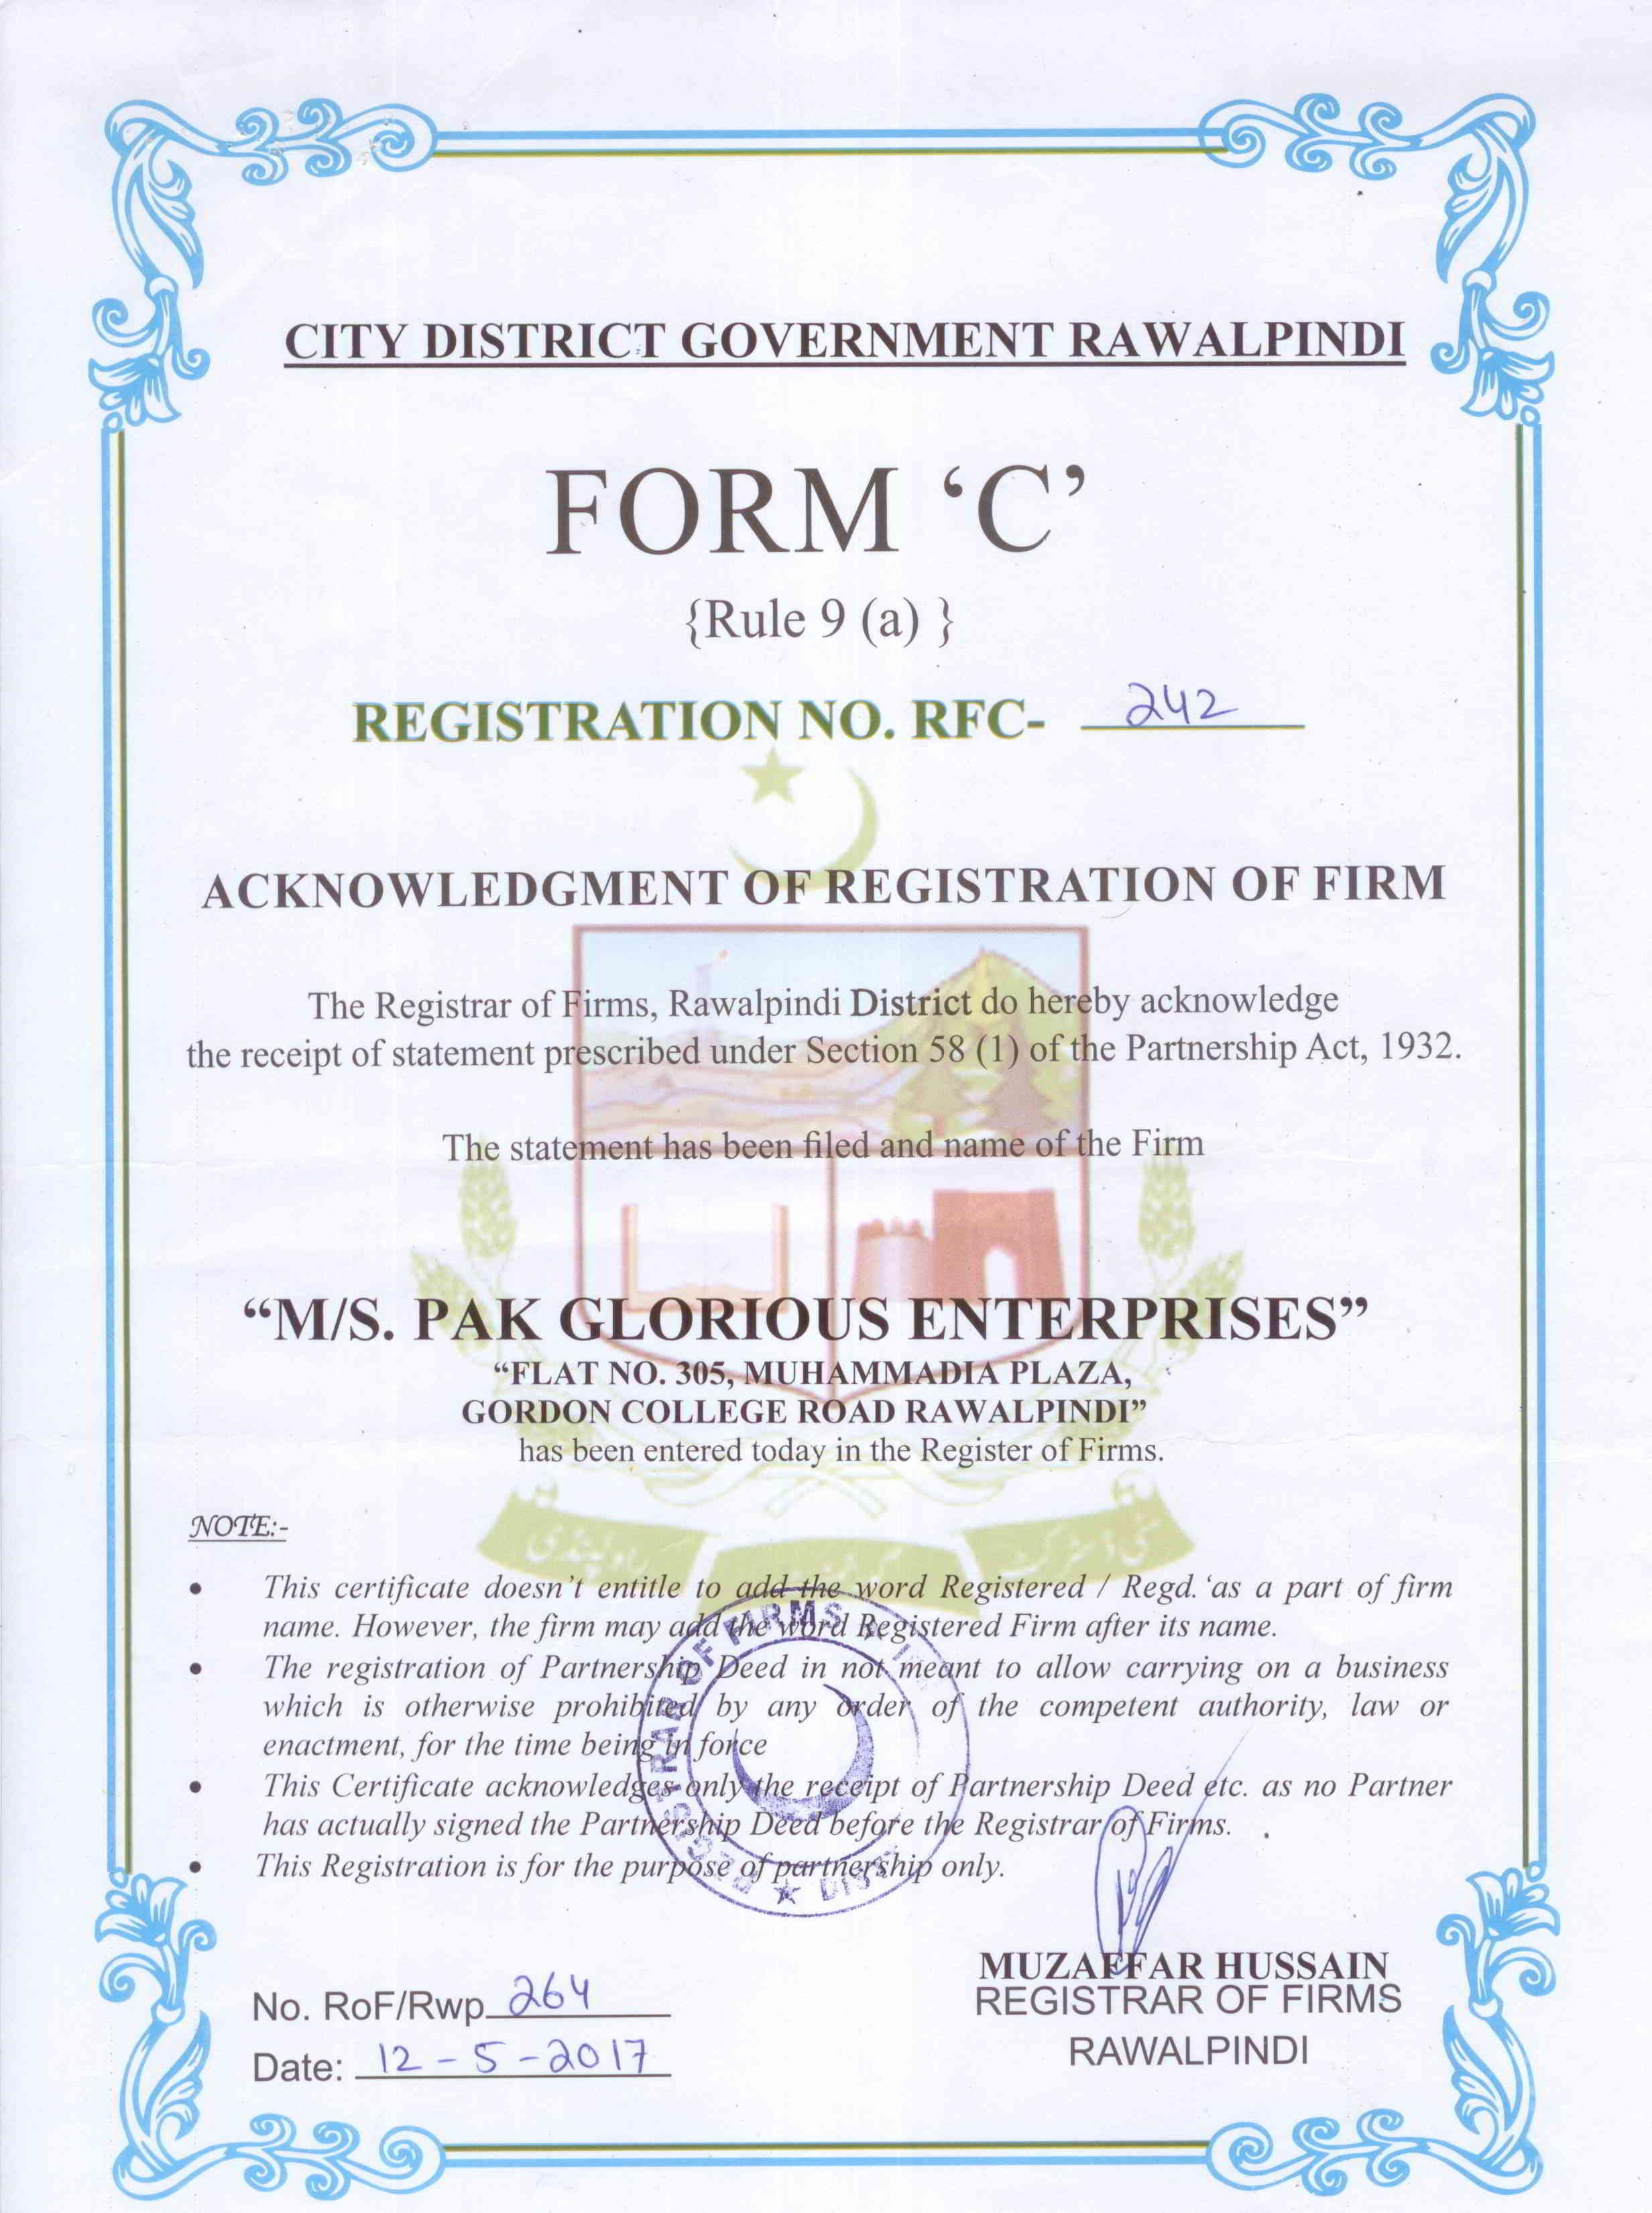 Company Profile | Pak Glorious Enterprises